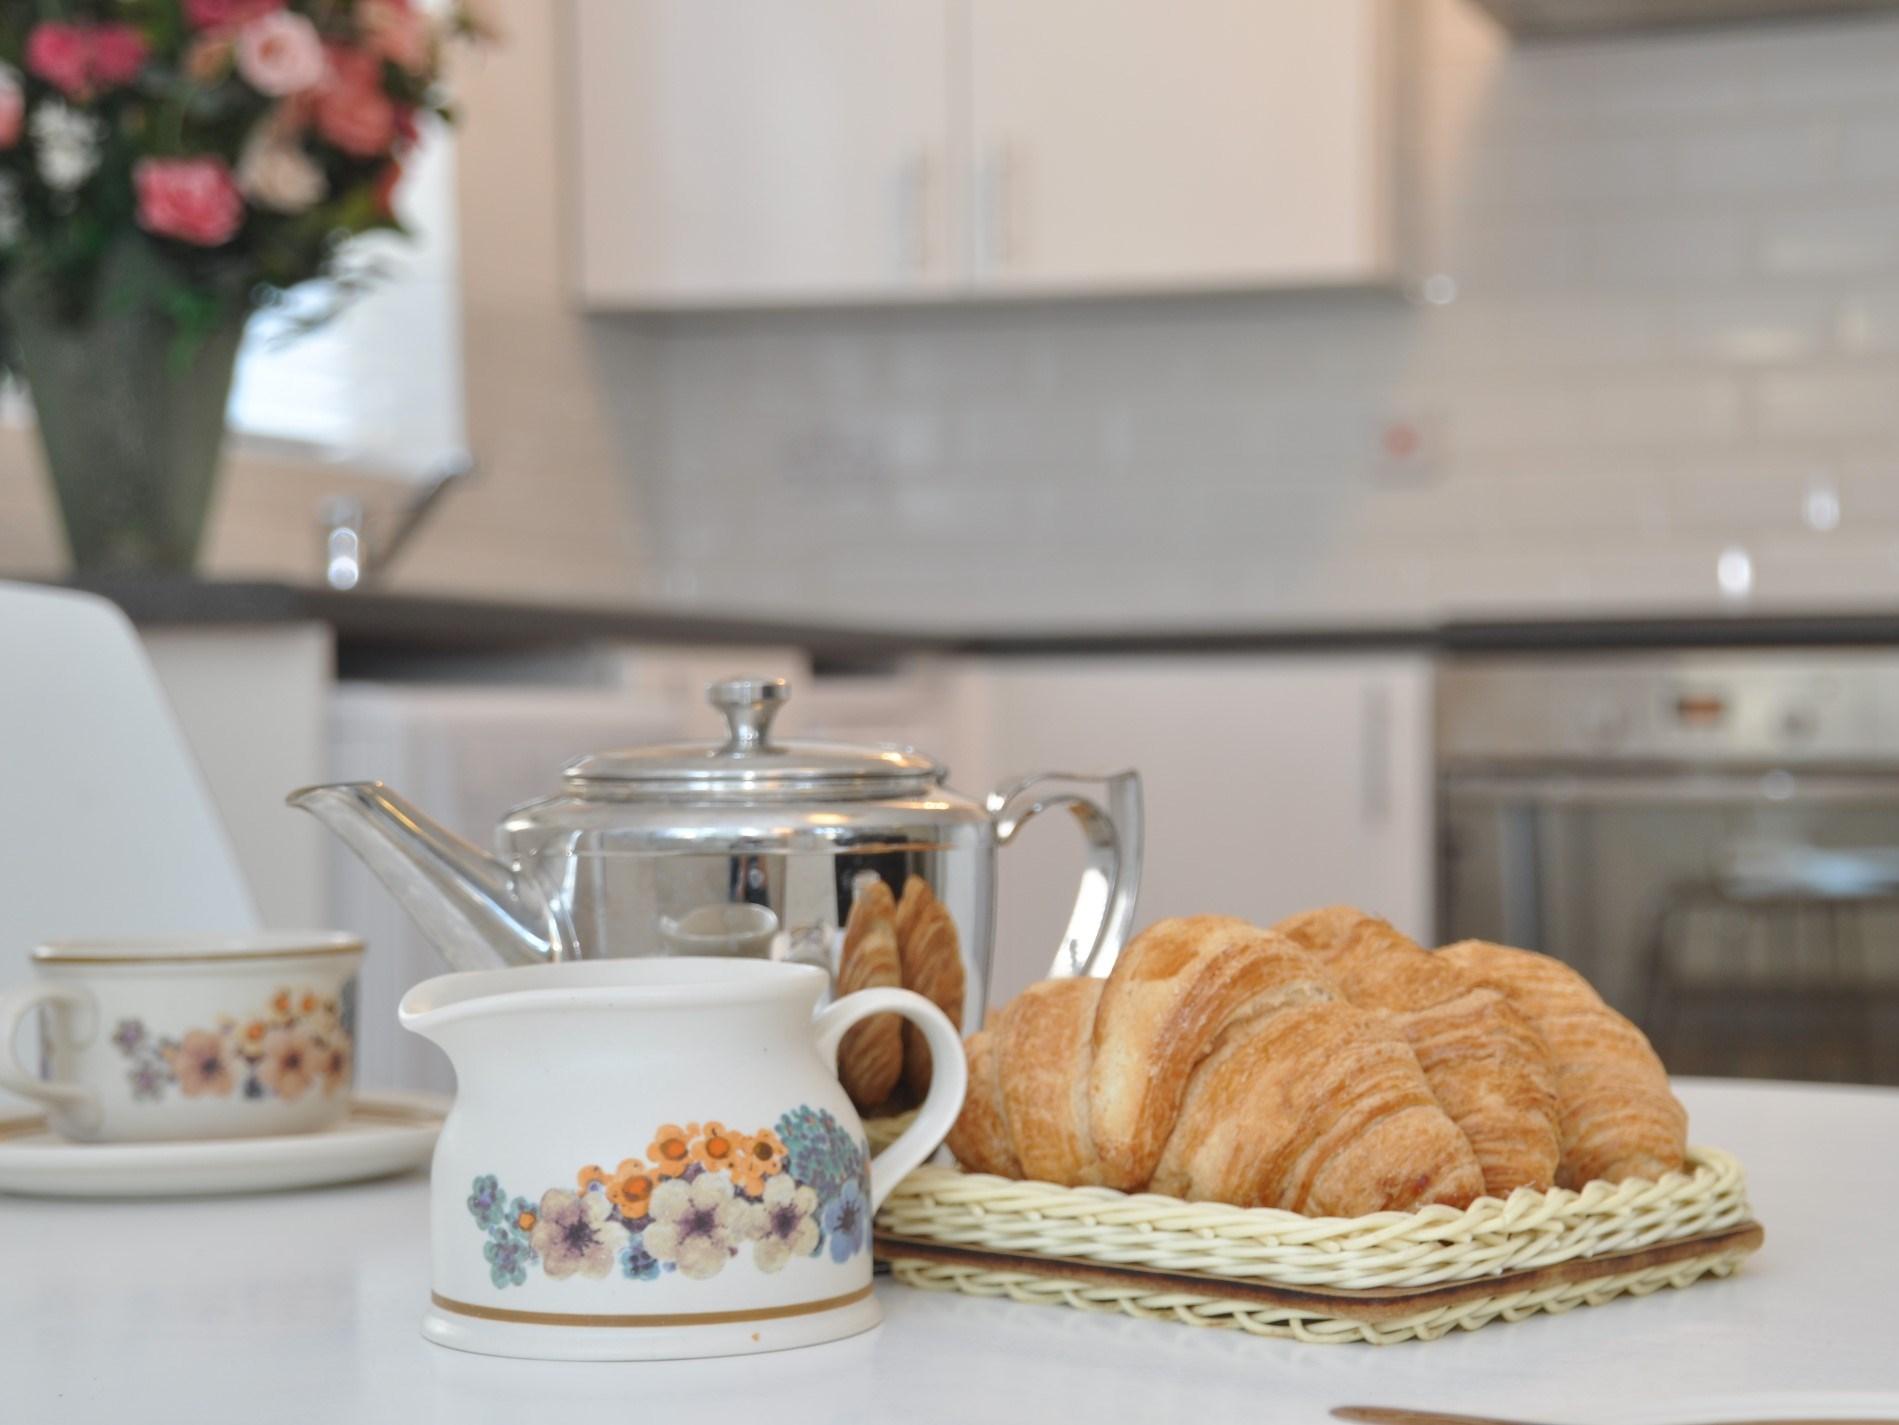 Enjoy breakfast with a pot of tea